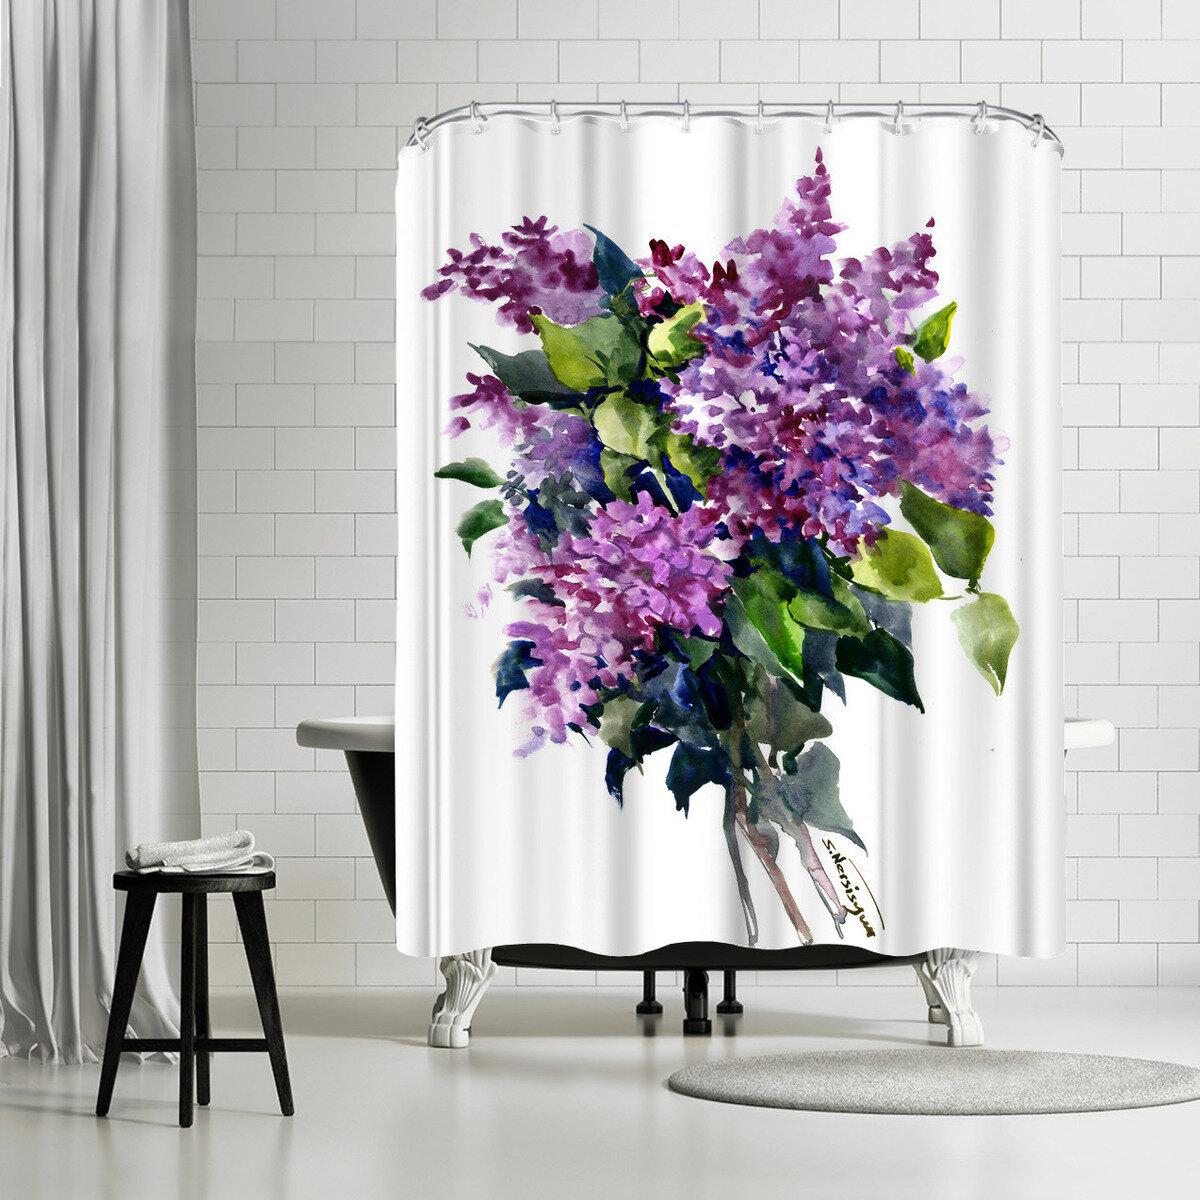 East Urban Home Suren Nersisyan Lilac Flowers 2 Single Shower Curtain Wayfair